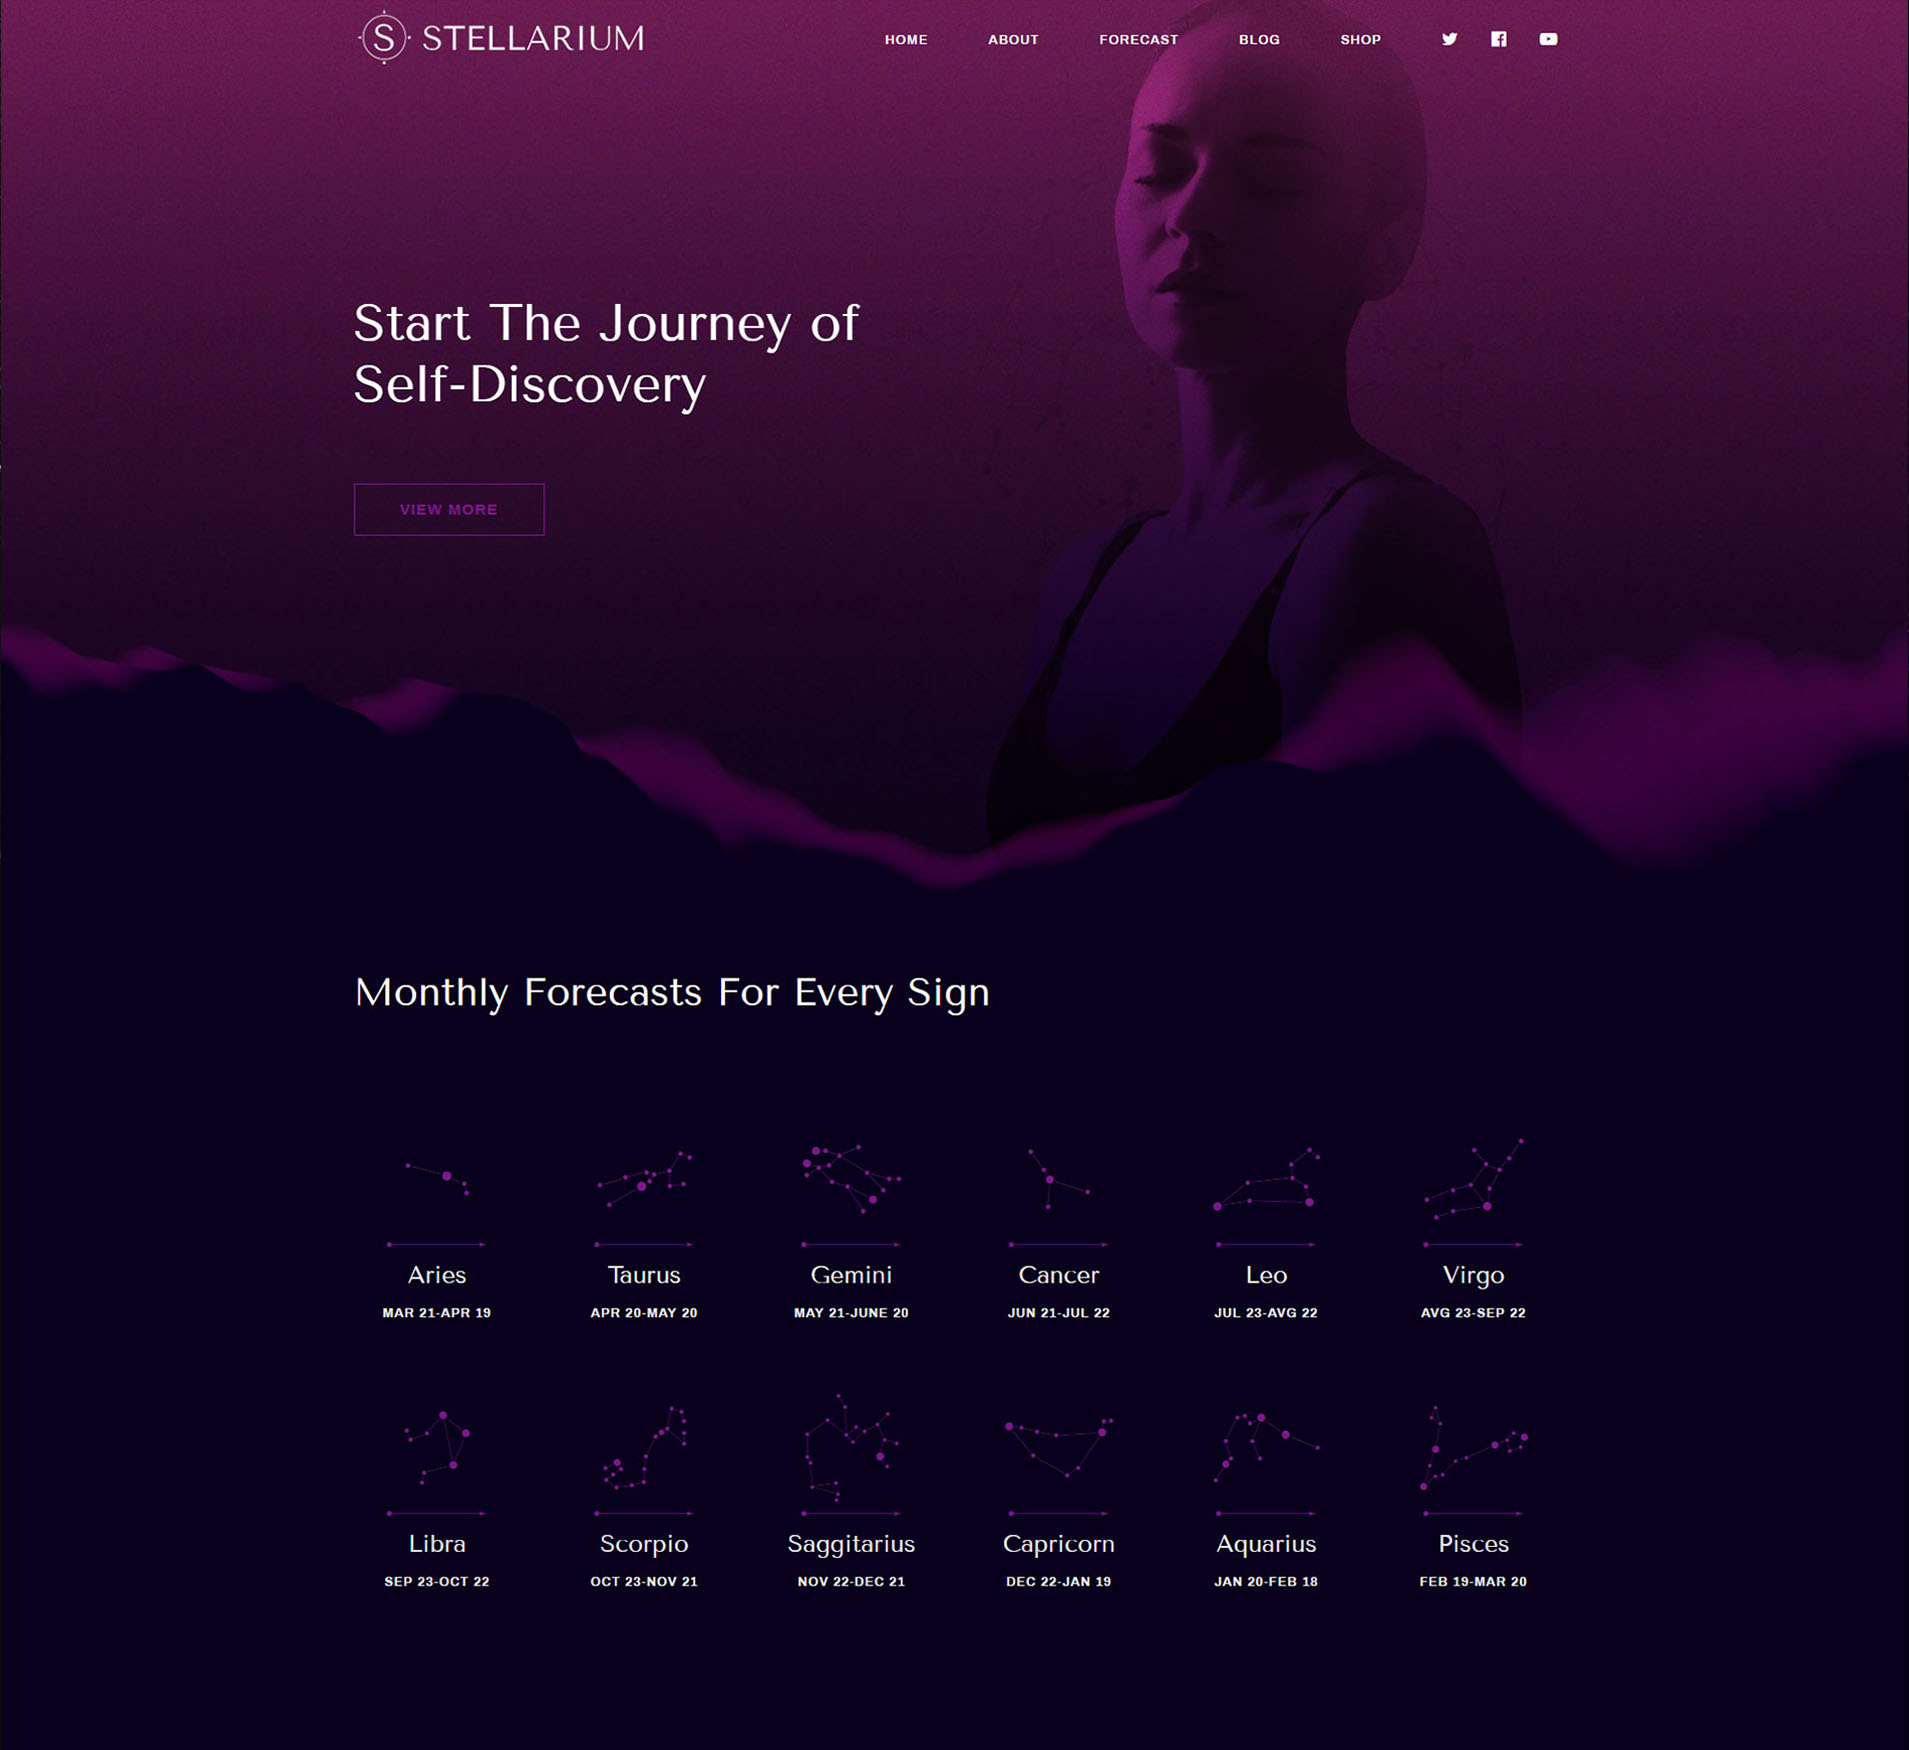 https://stellarium.bold-themes.com/wp-content/uploads/2018/07/highlight_color_demo.jpg